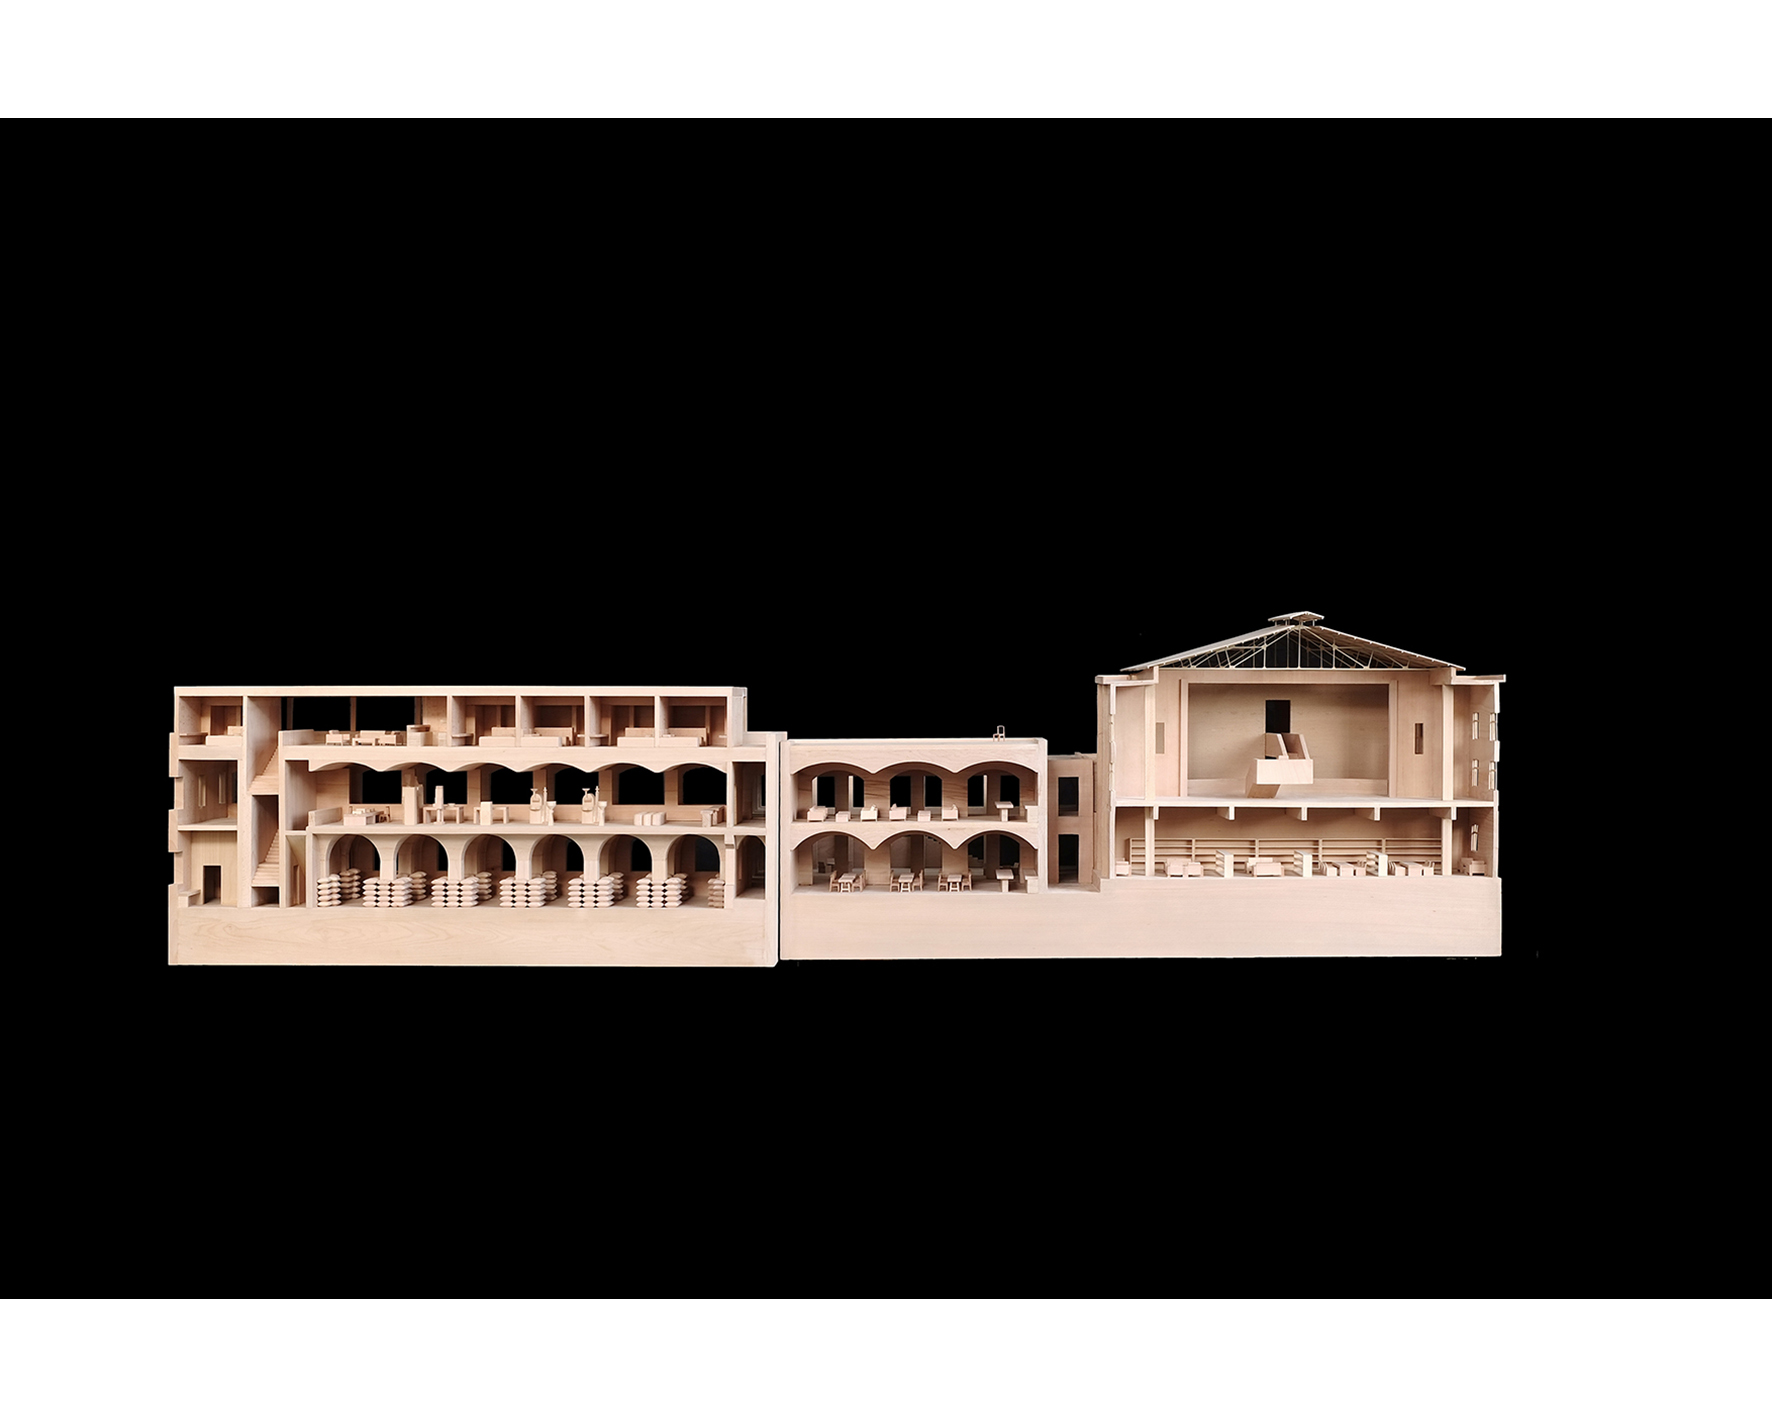 1-25剖面模型1 1-25 sectional model1.jpg